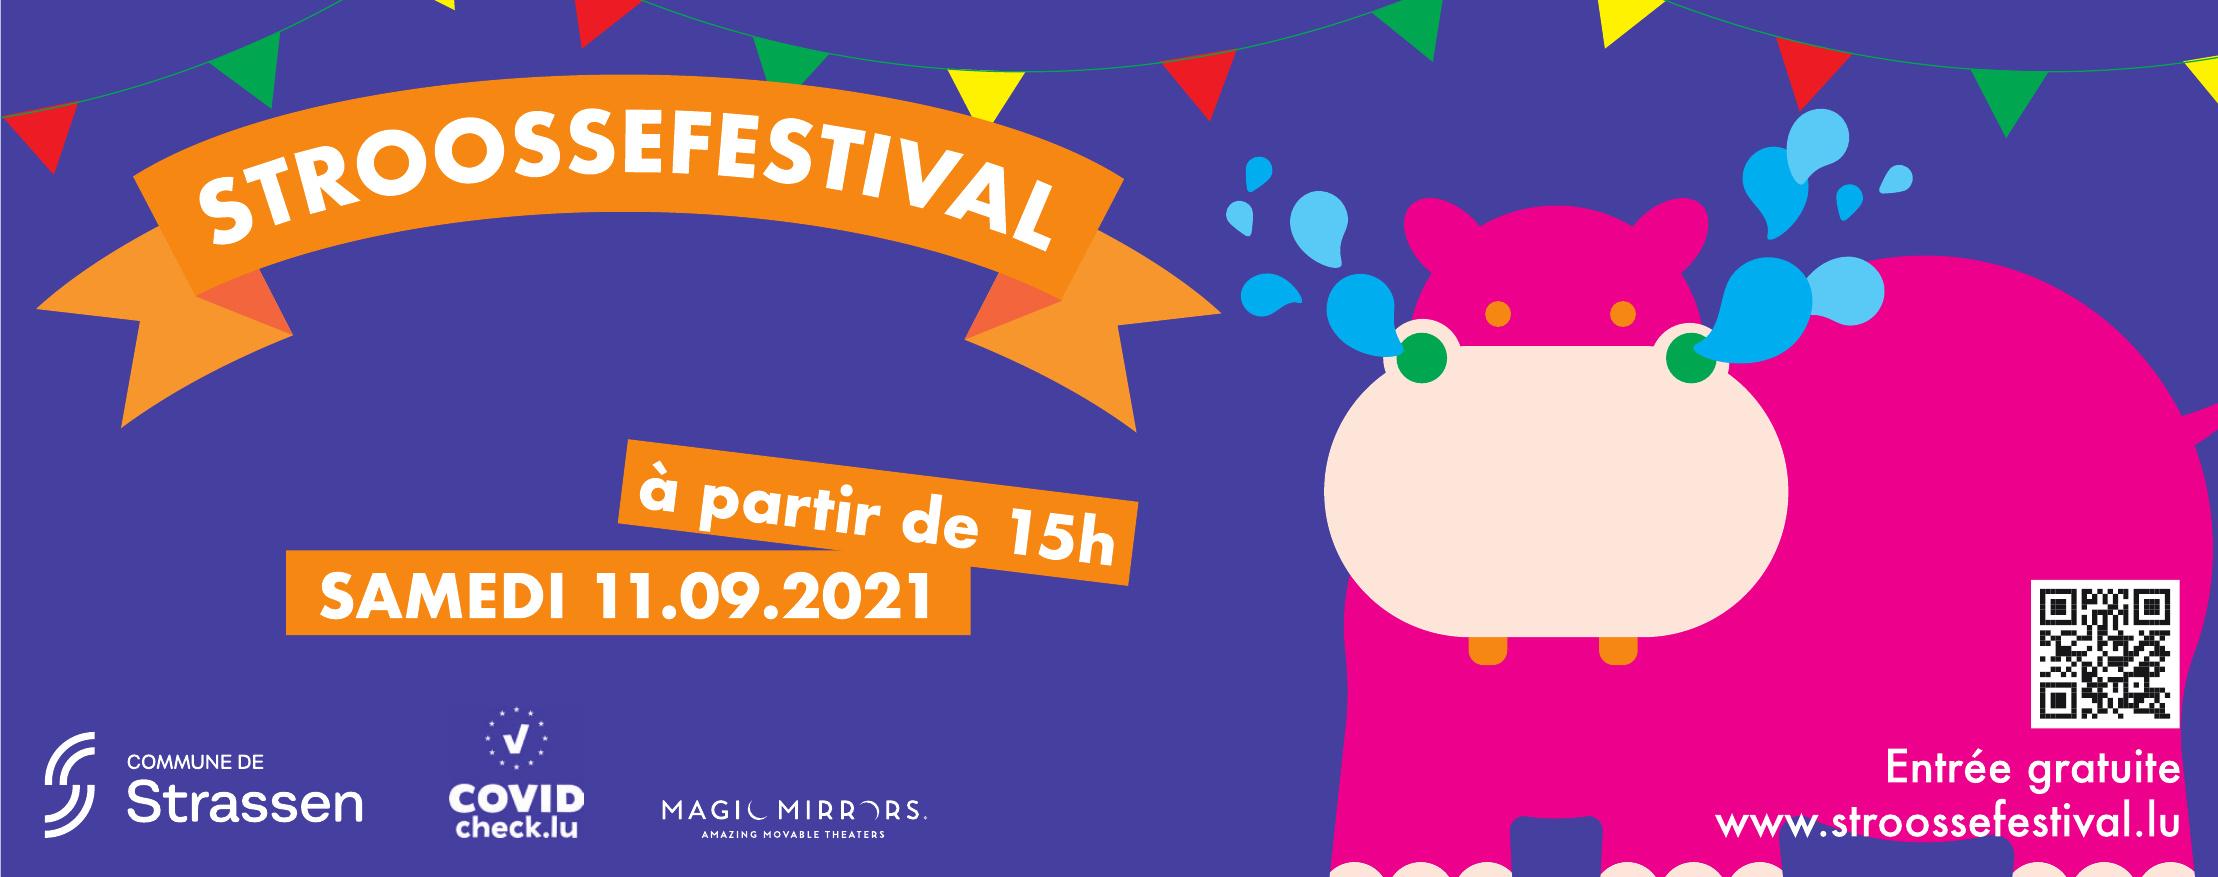 Stroossefestival